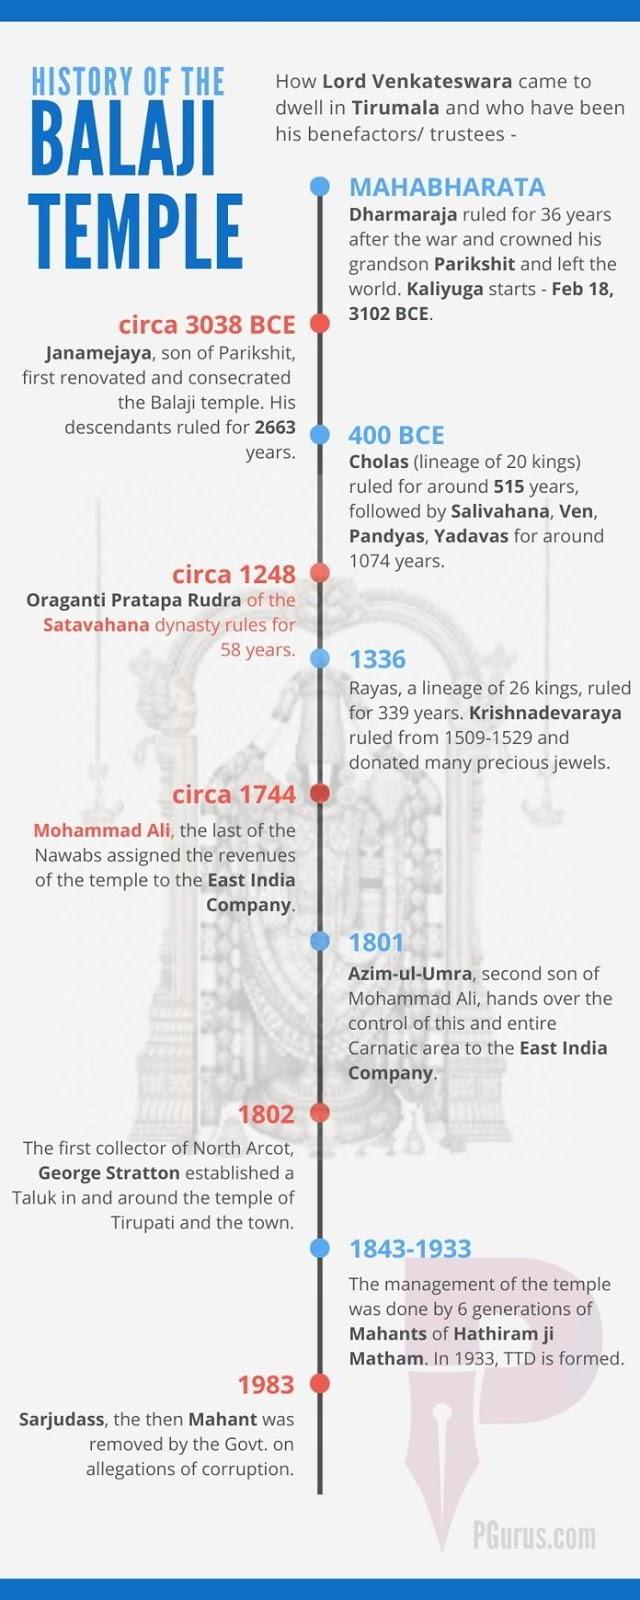 Figure 4. Balaji Temple timeline